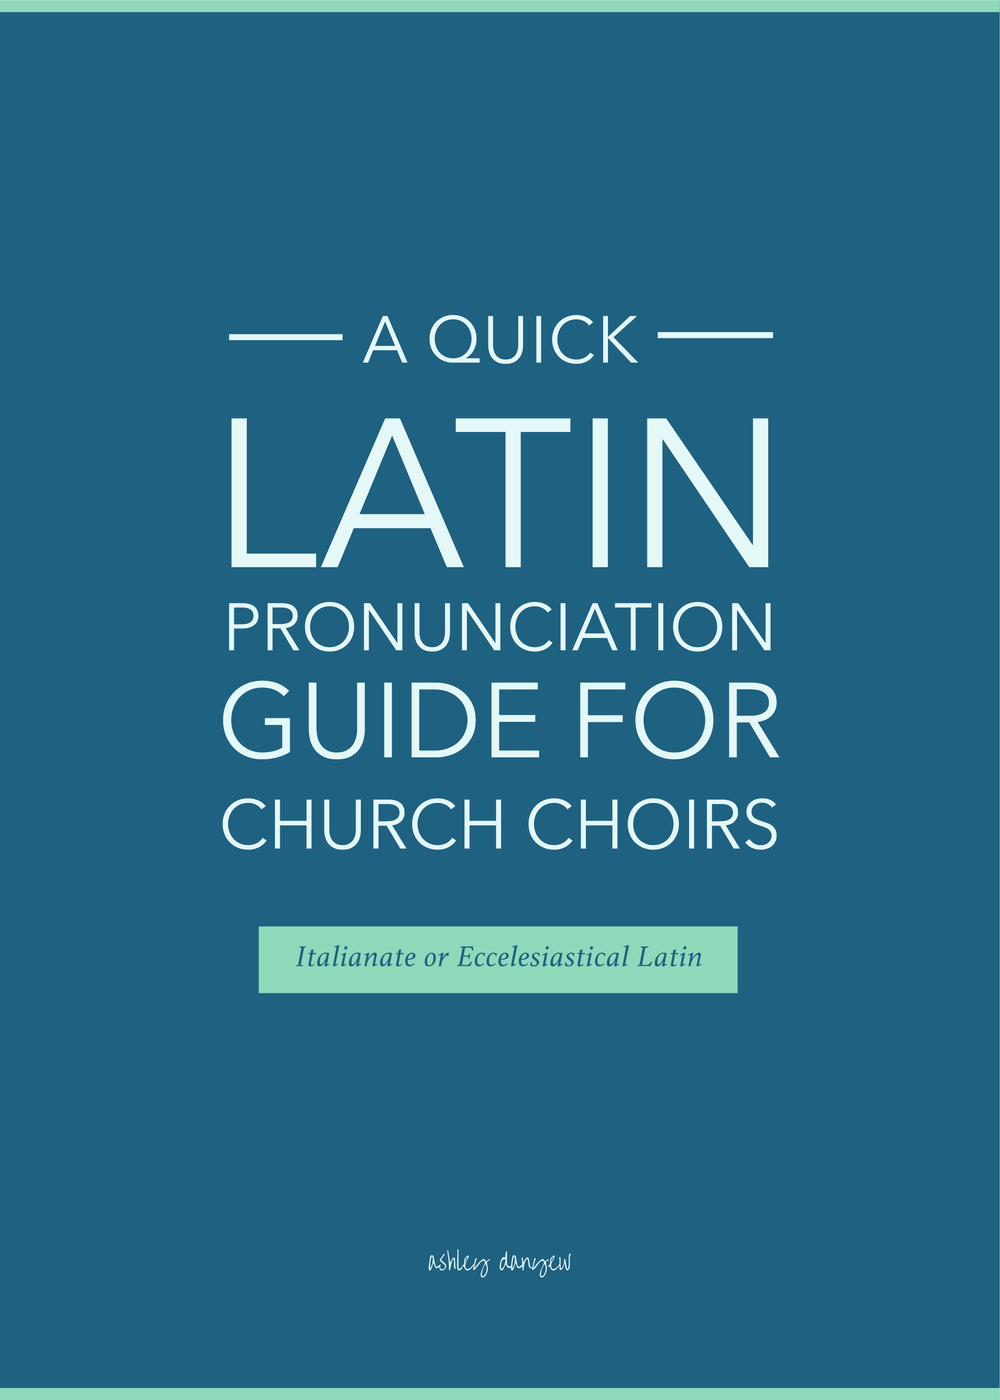 A Quick Latin Pronunciation Guide for Church Choirs